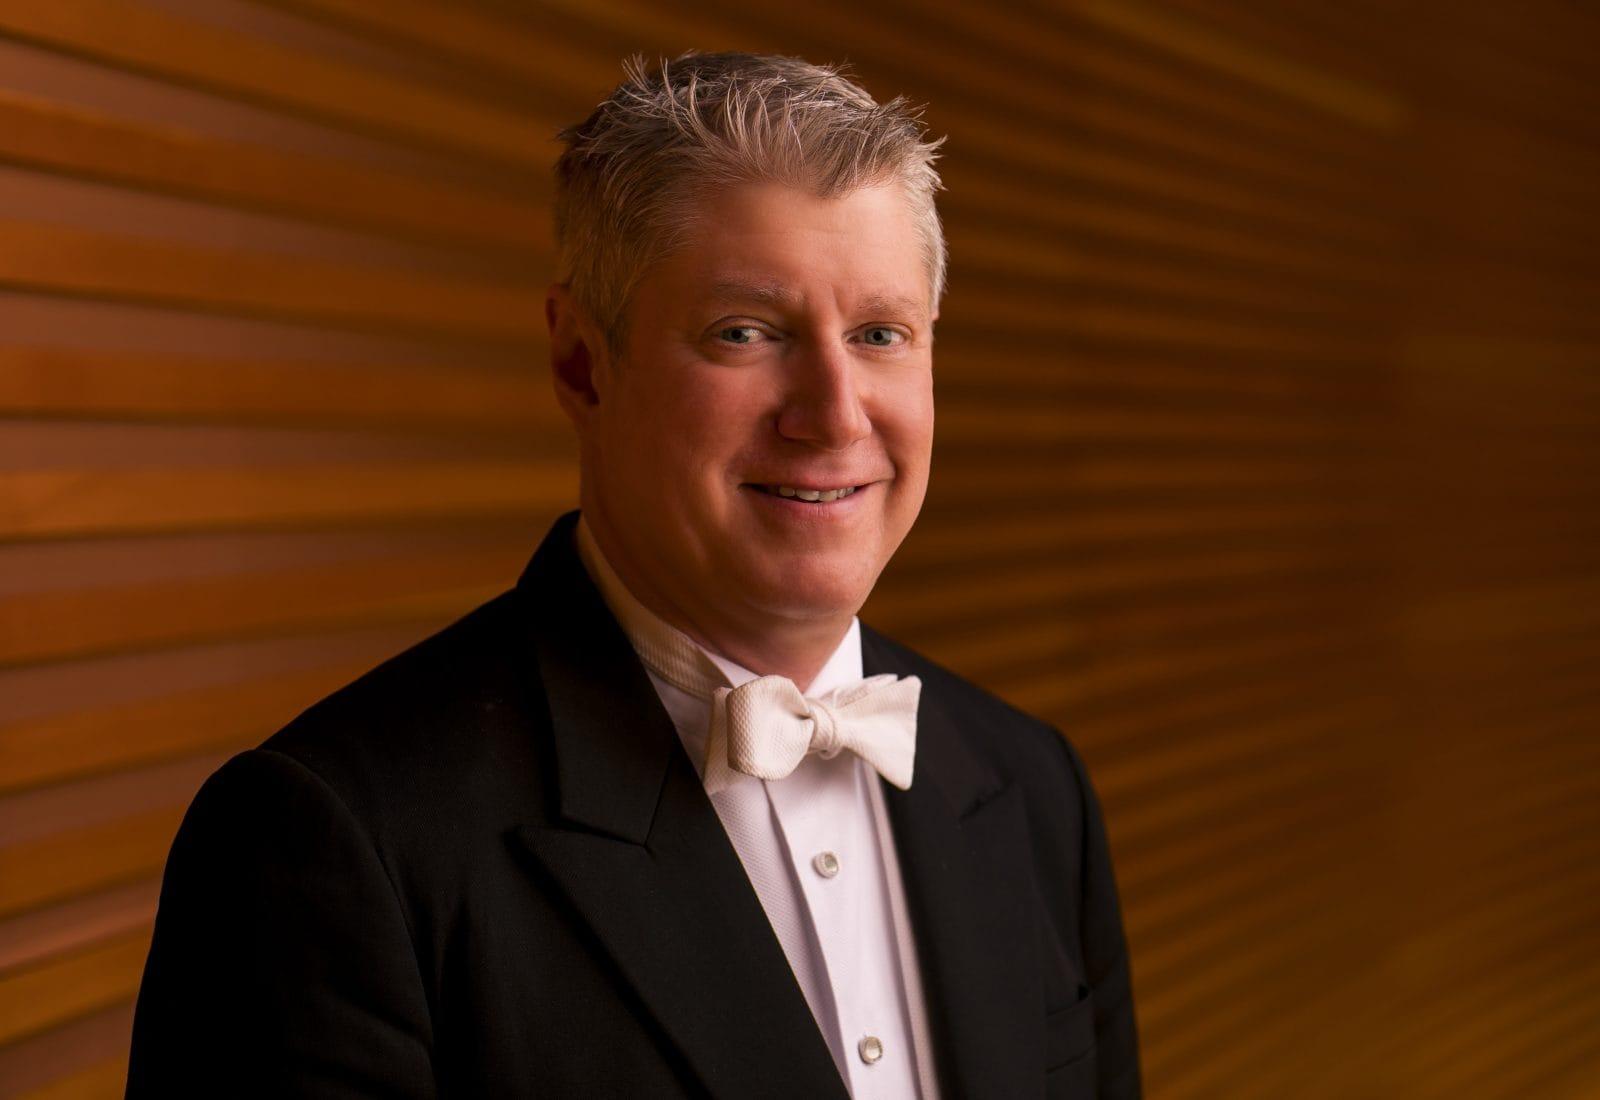 Michael Stern